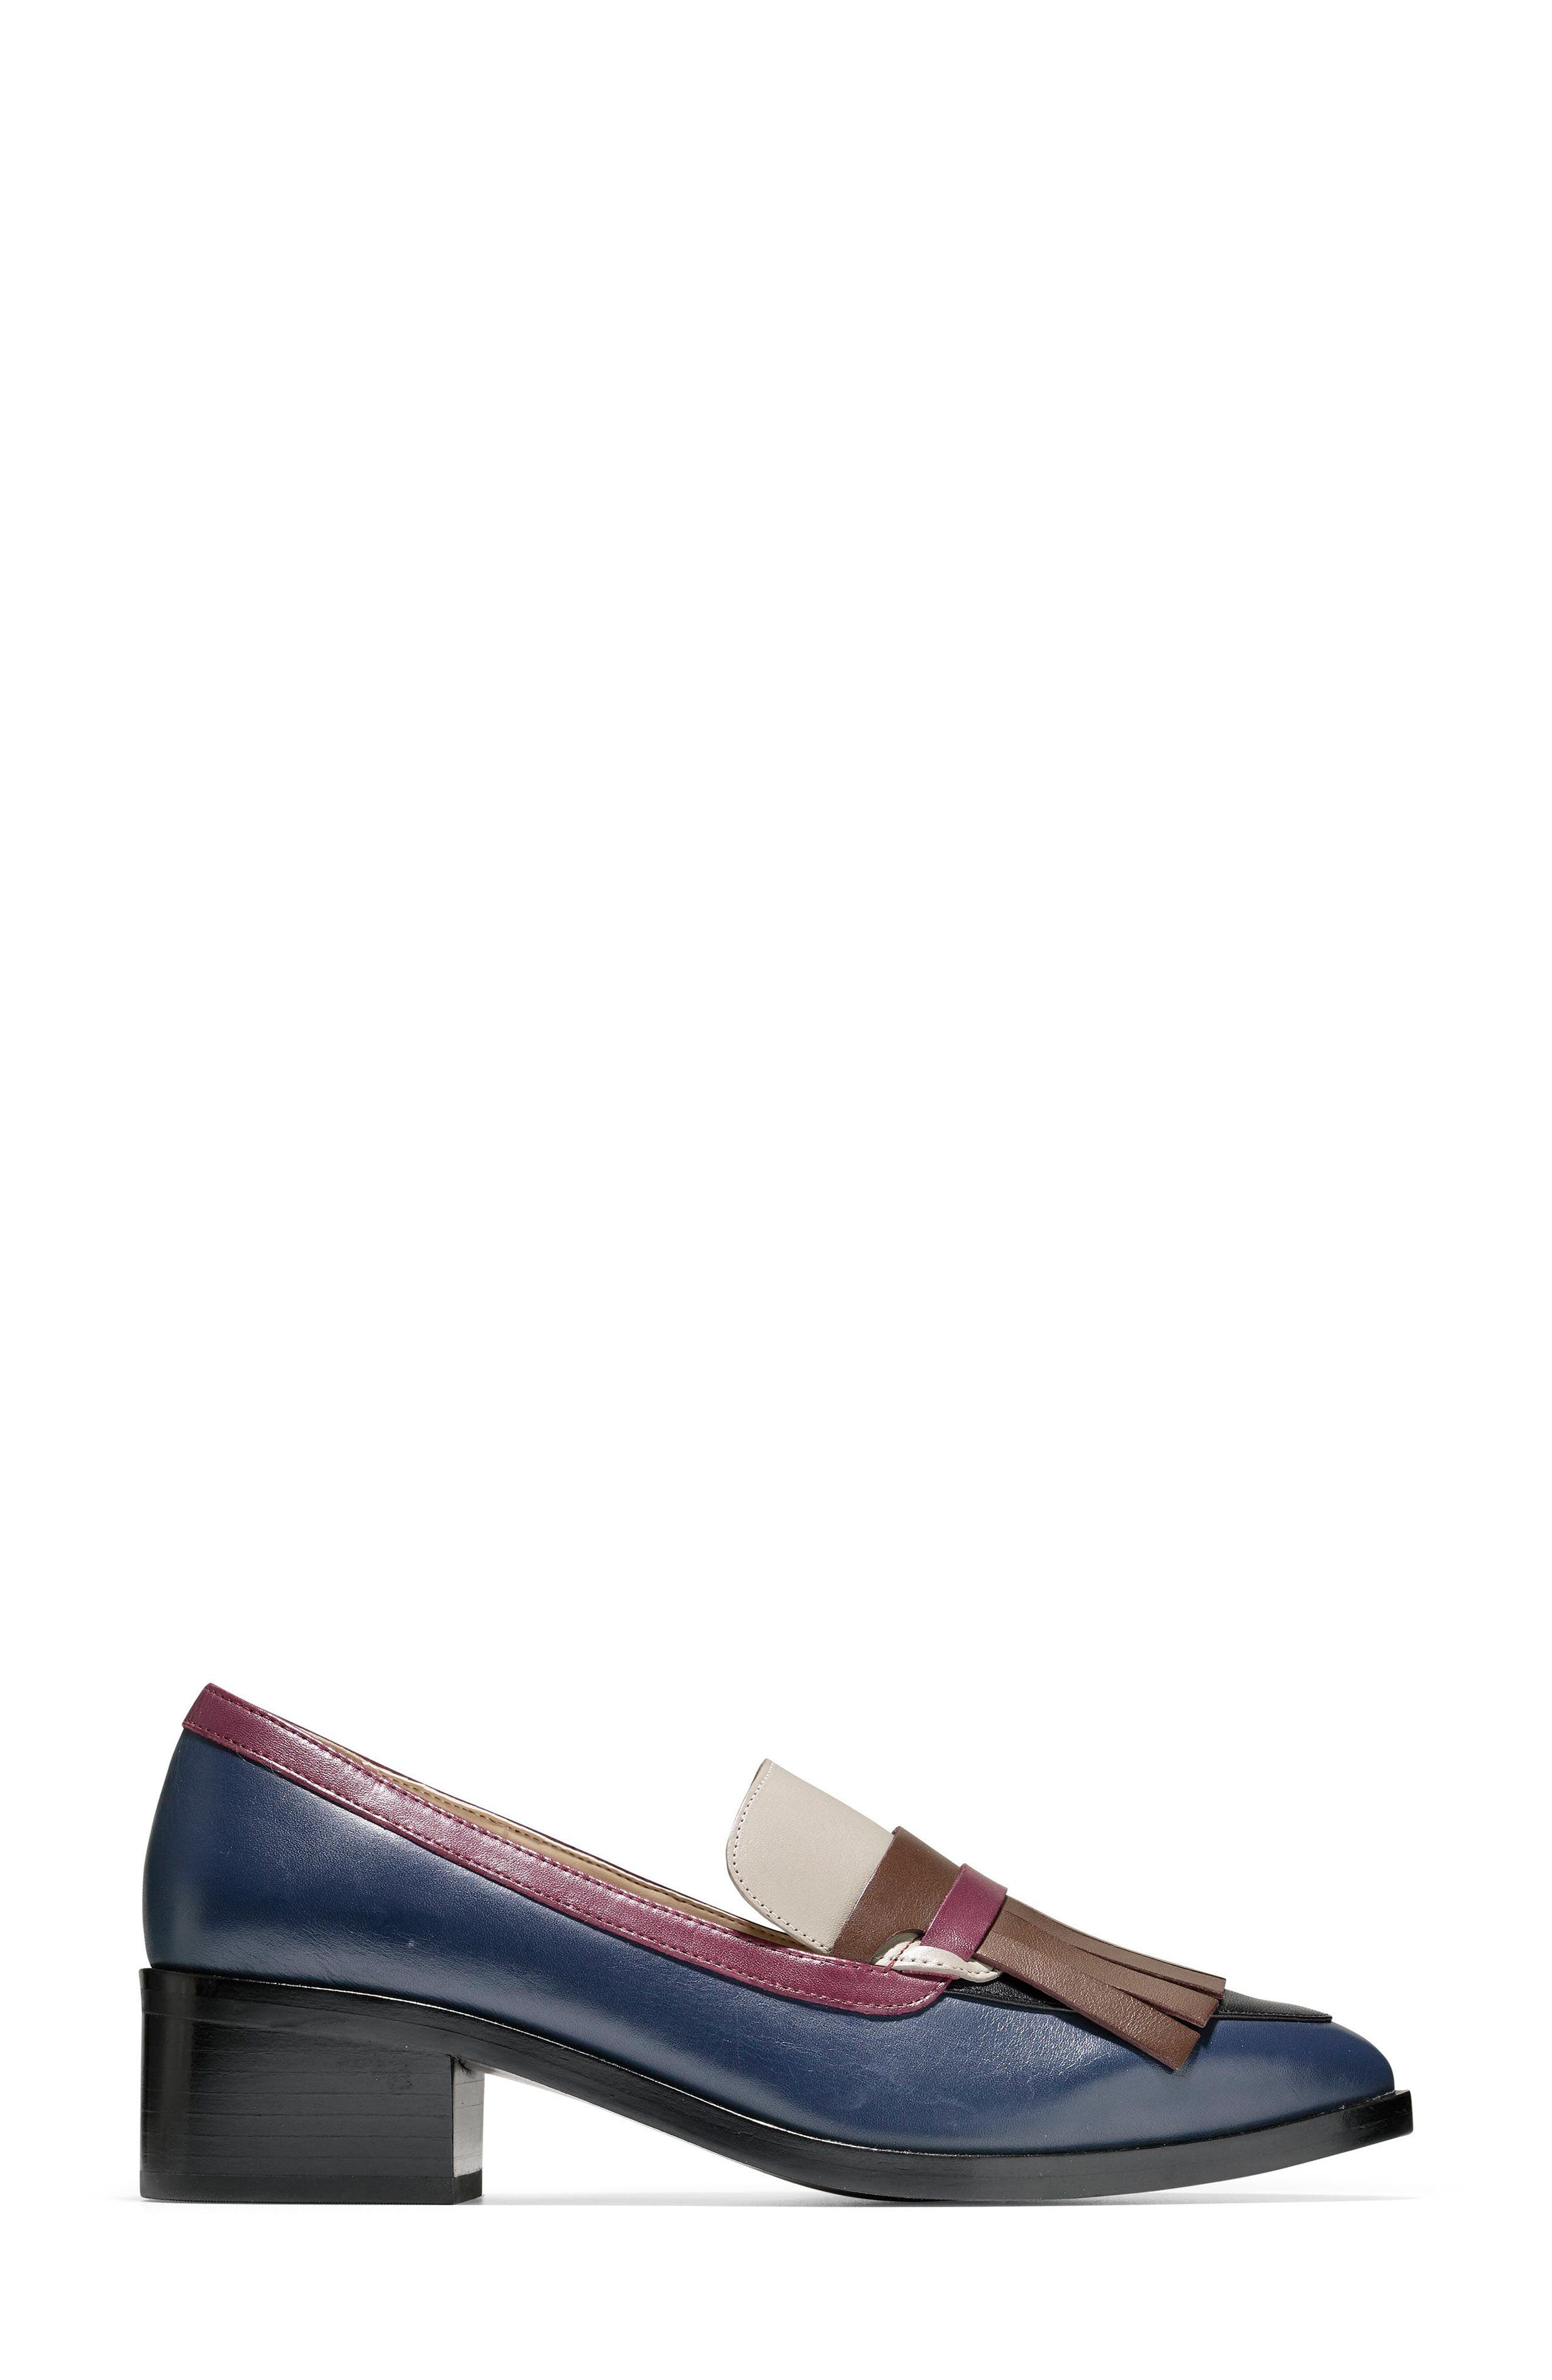 Margarite Loafer Pump,                             Alternate thumbnail 3, color,                             Marine Blue Leather